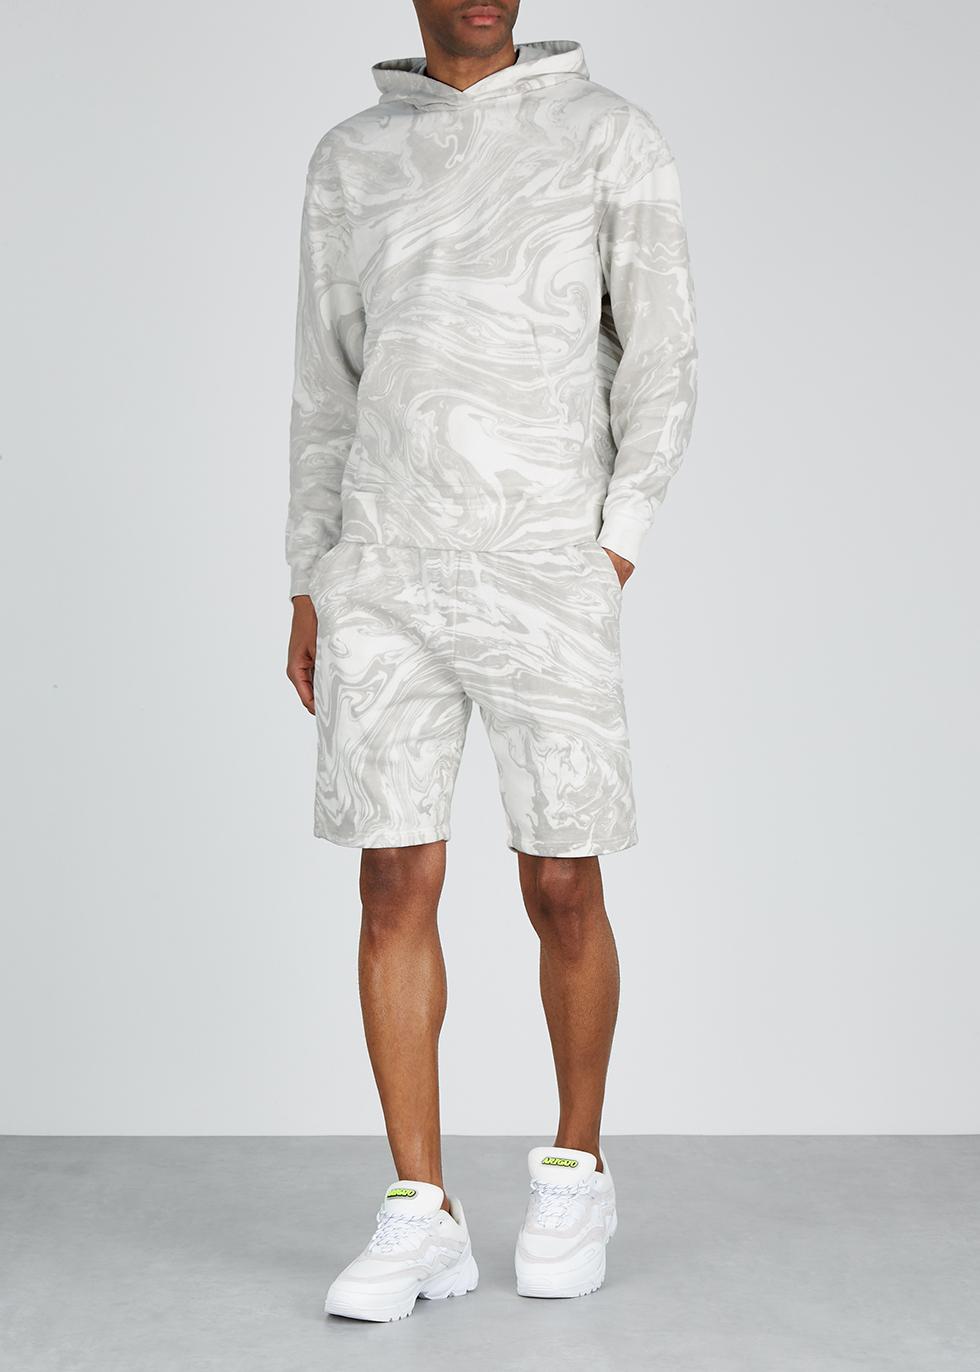 Grey marble-dyed jersey sweatshirt - John Elliott